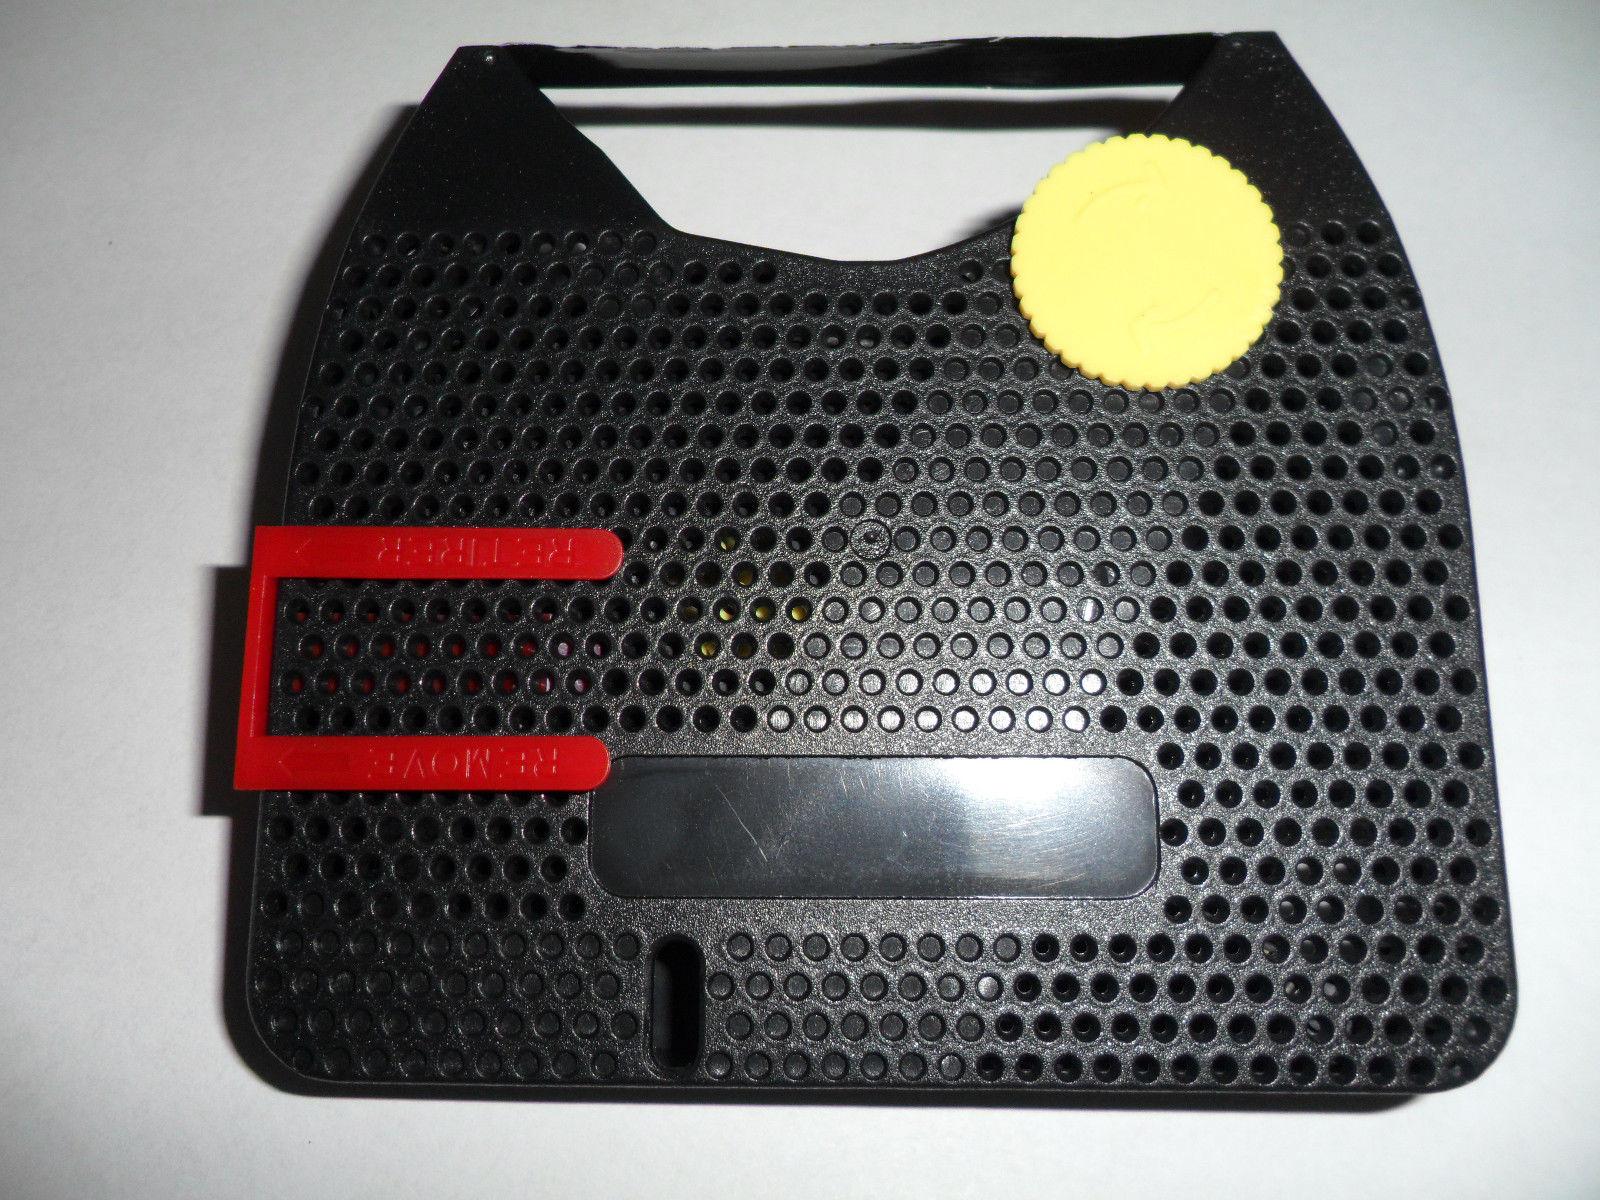 Smith Corona DWP-1 DX2600 DX3400 Typewriter Ribbon (2 Pack) Replaces 21000